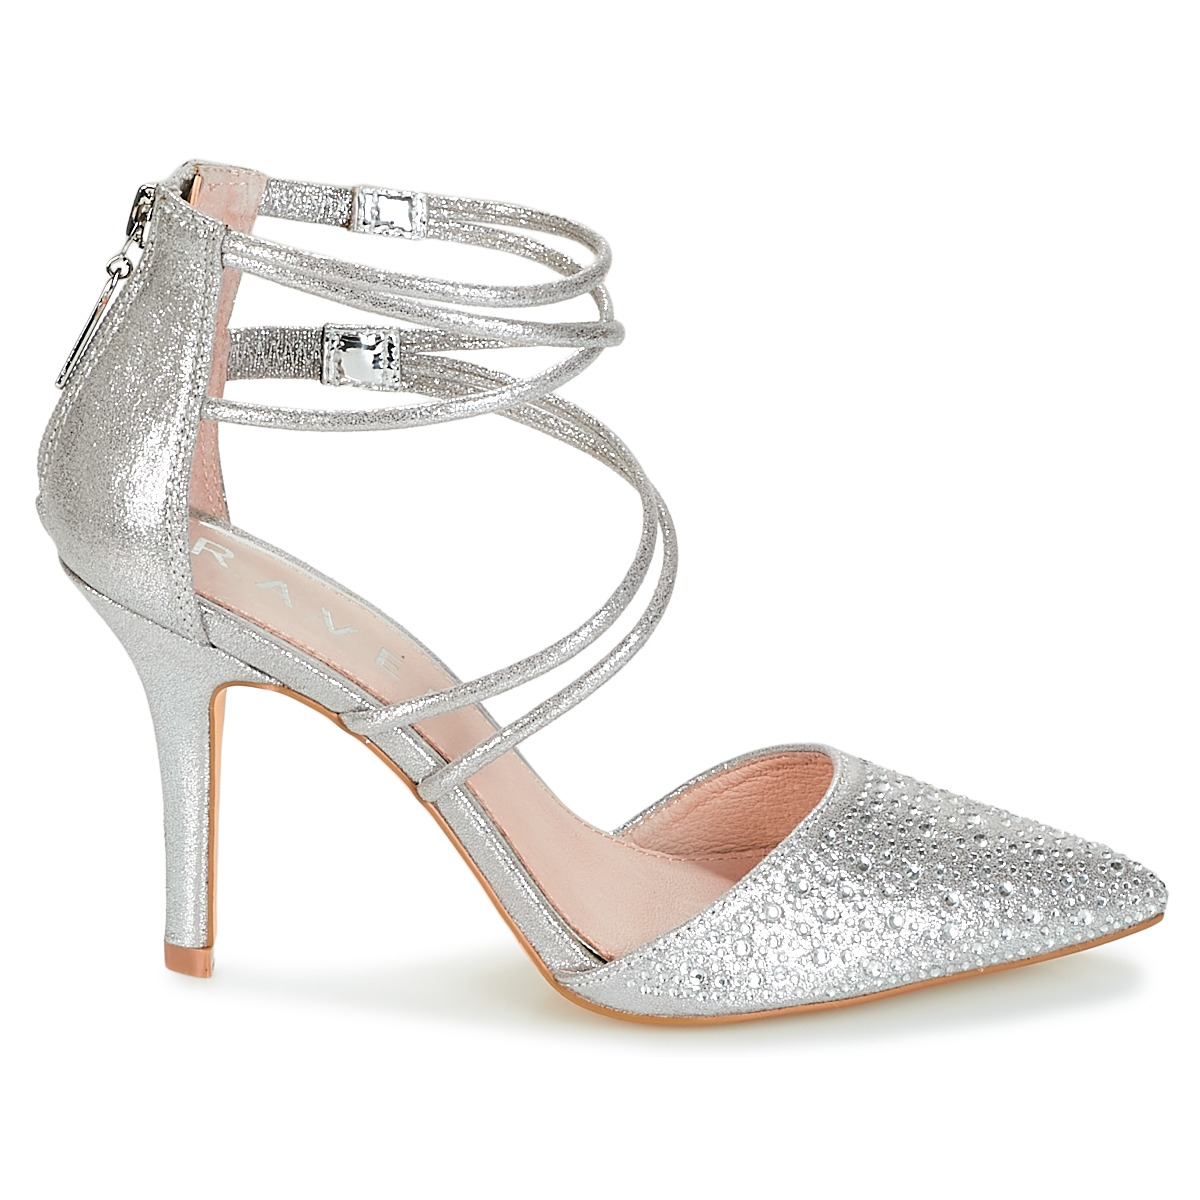 Escarpins Chaussures Chaussures Escarpins Bonita Ravel Bonita Ravel Ravel c4A3RL5jq